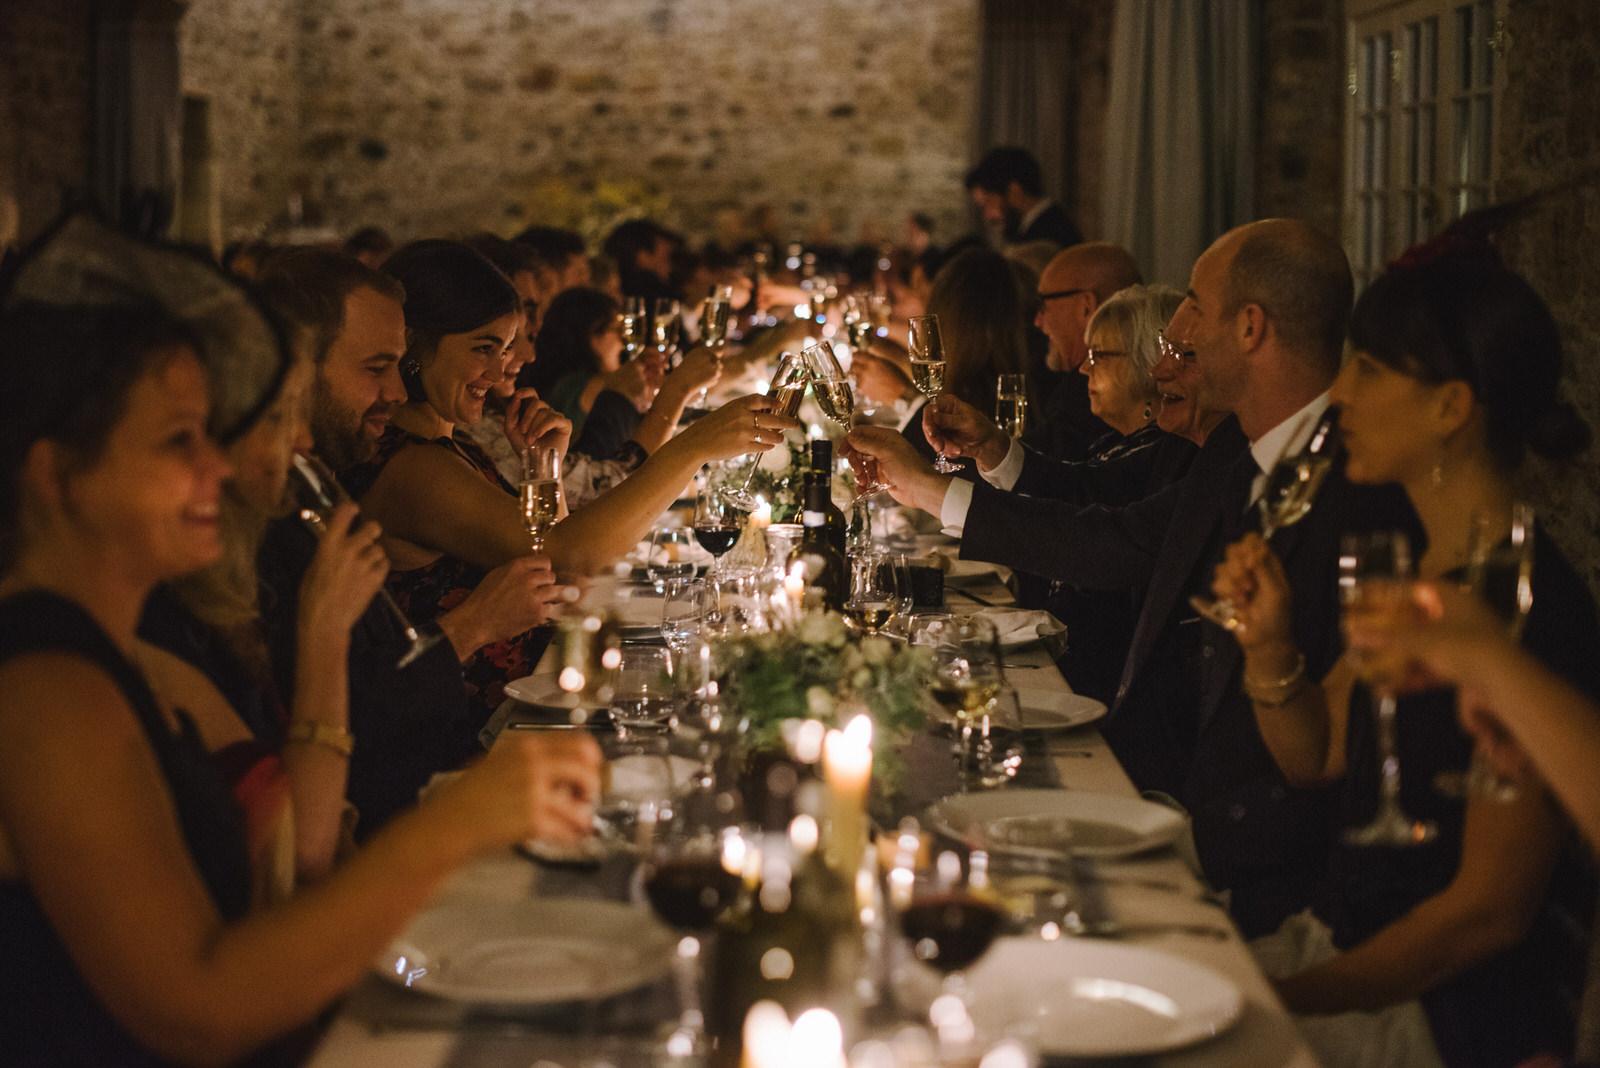 037-COLSTOUN-HOUSE-WEDDING-ALTERNATIVE-WEDDING-PHOTOGRAPHER-GLASGOW-WEDDING-PHOTOGRAPHER-STYLISH-SCOTTISH-WEDDING.JPG